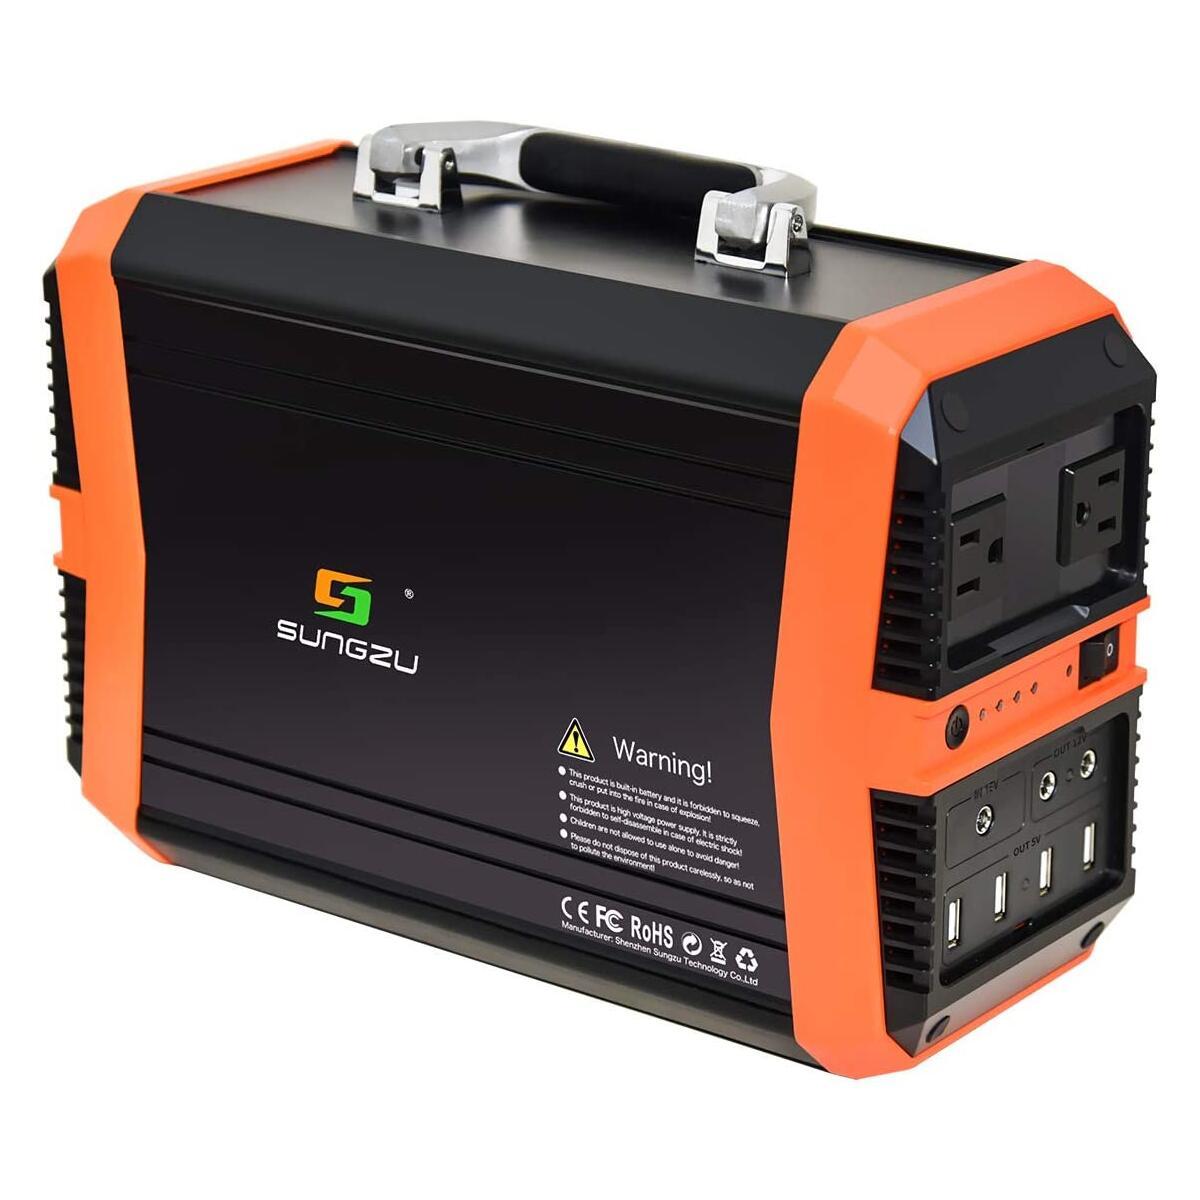 SUNGZU Portable Power Station 300W, Portable Generator 346Wh 11.1V/31.2Ah Backup Lithium Battery Solar Generator